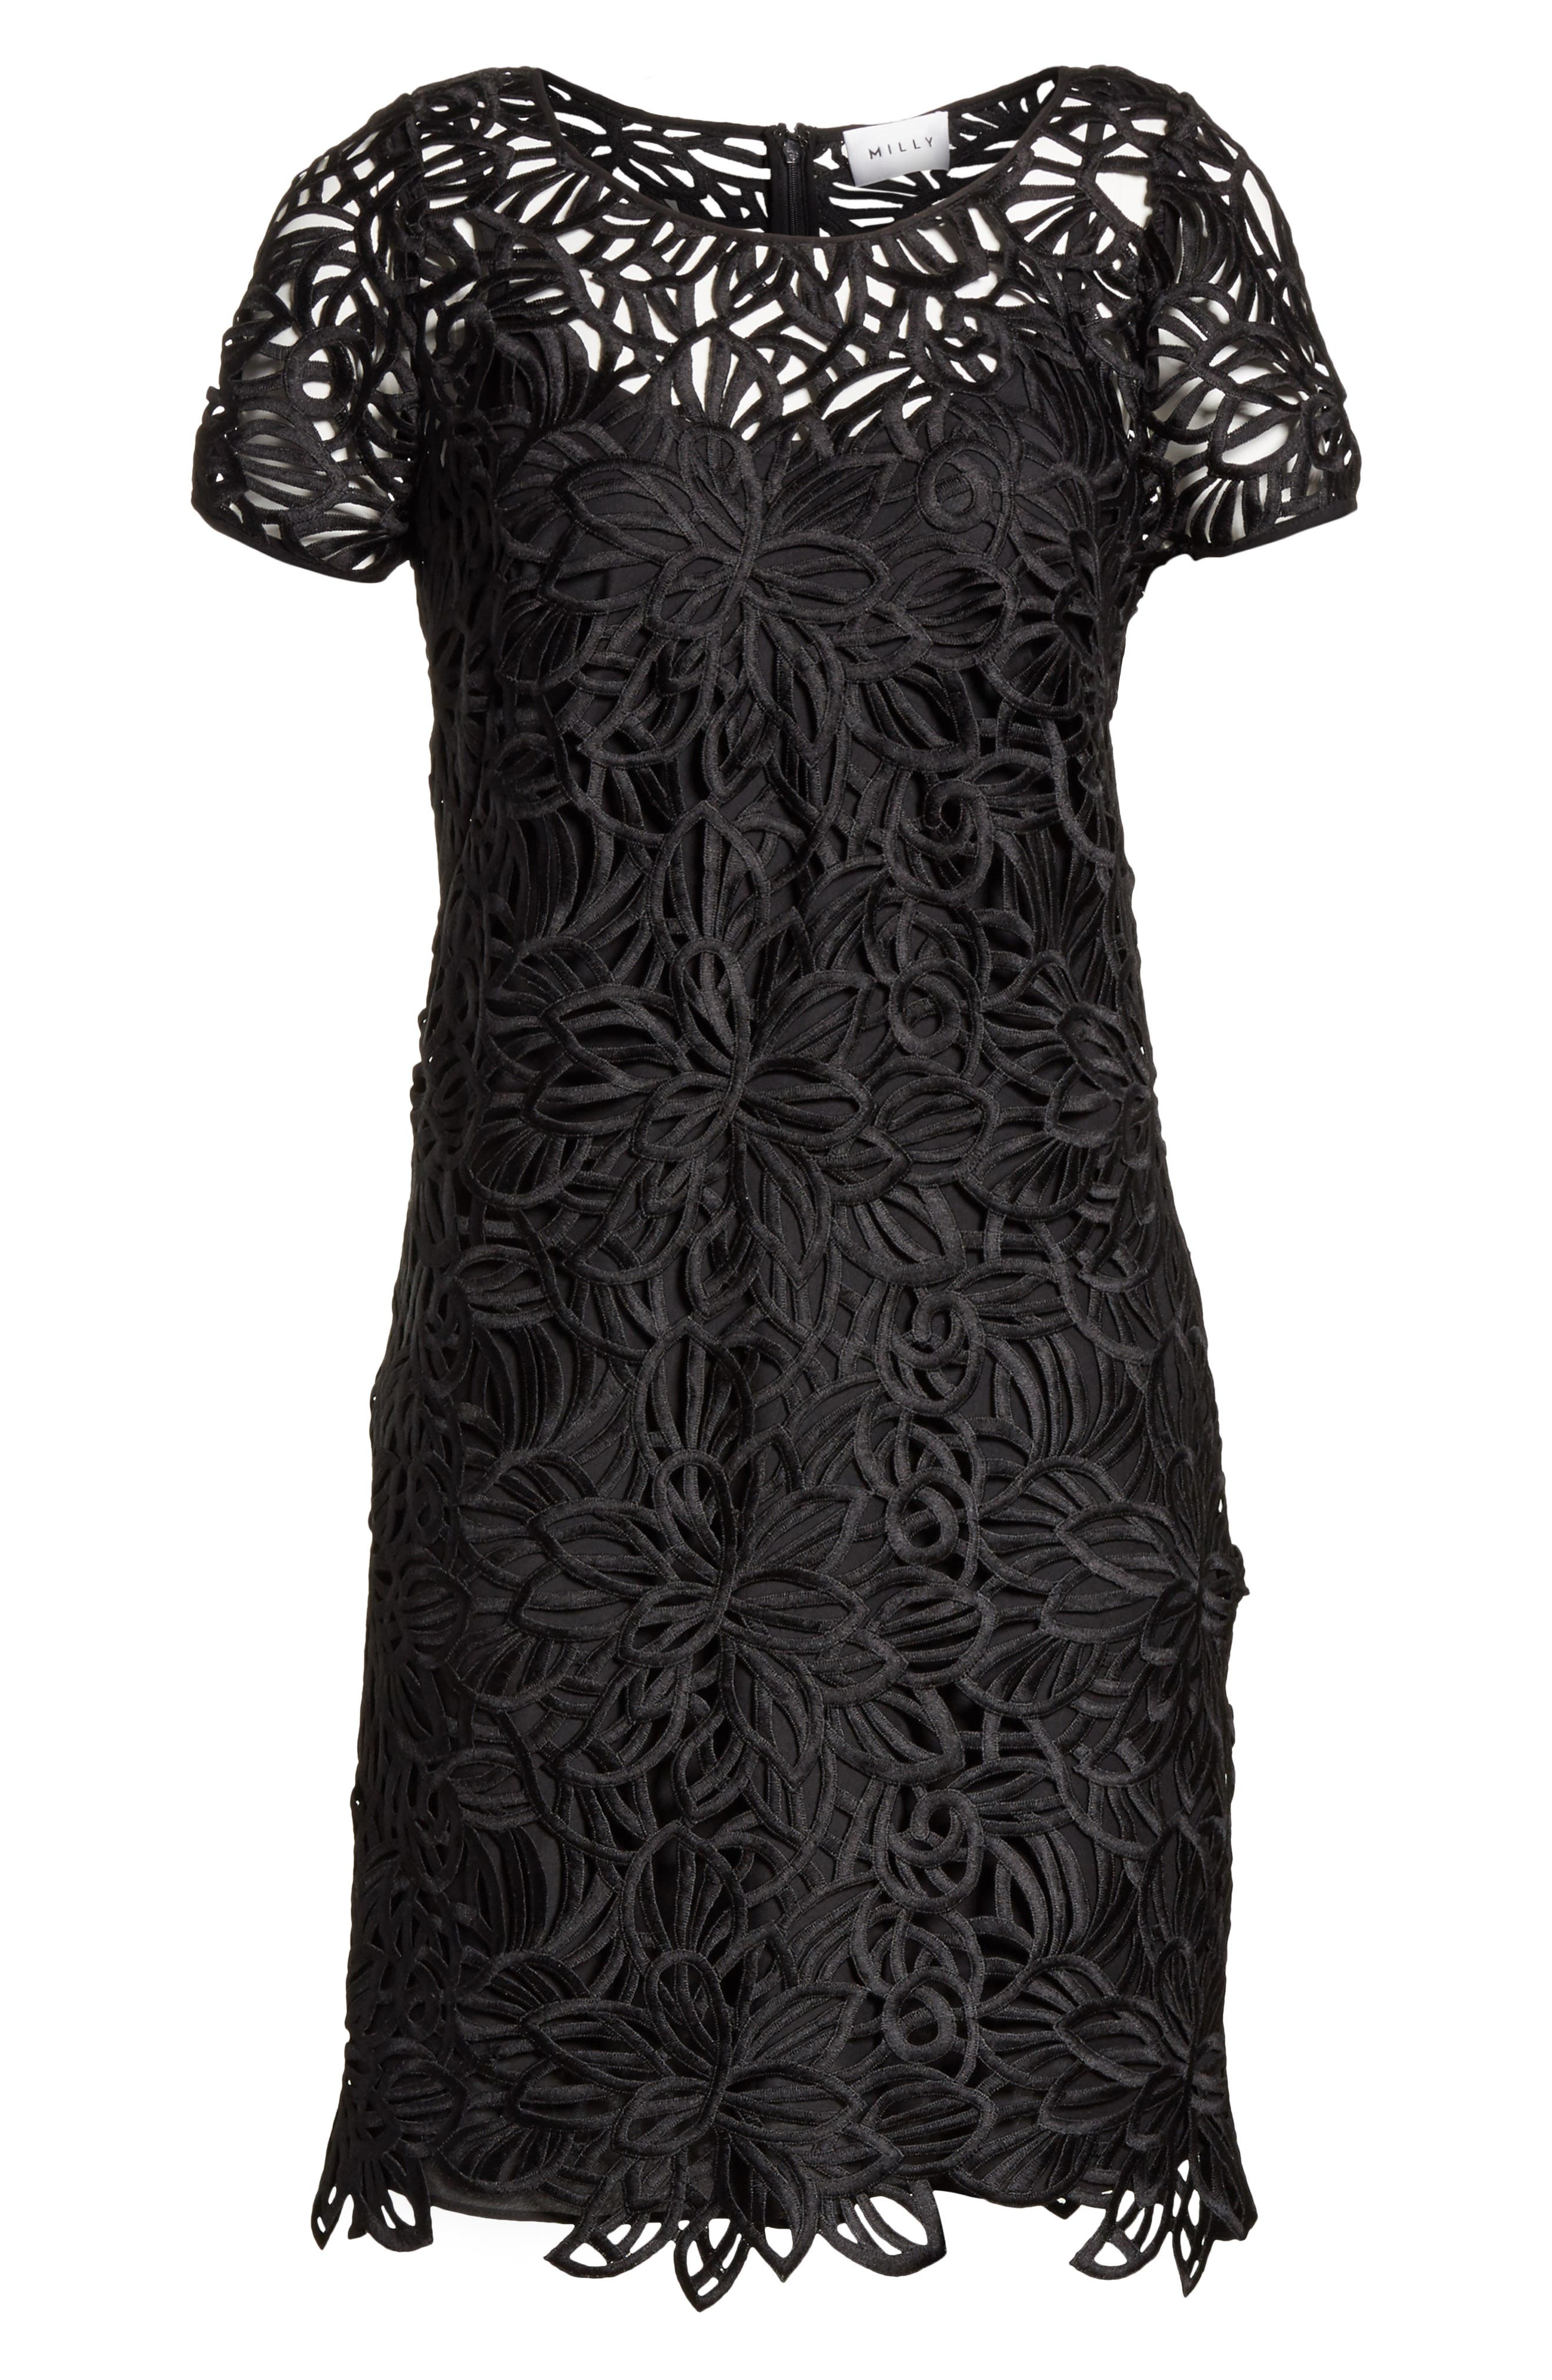 Chloe Lace Shift Dress,                             Alternate thumbnail 6, color,                             Black